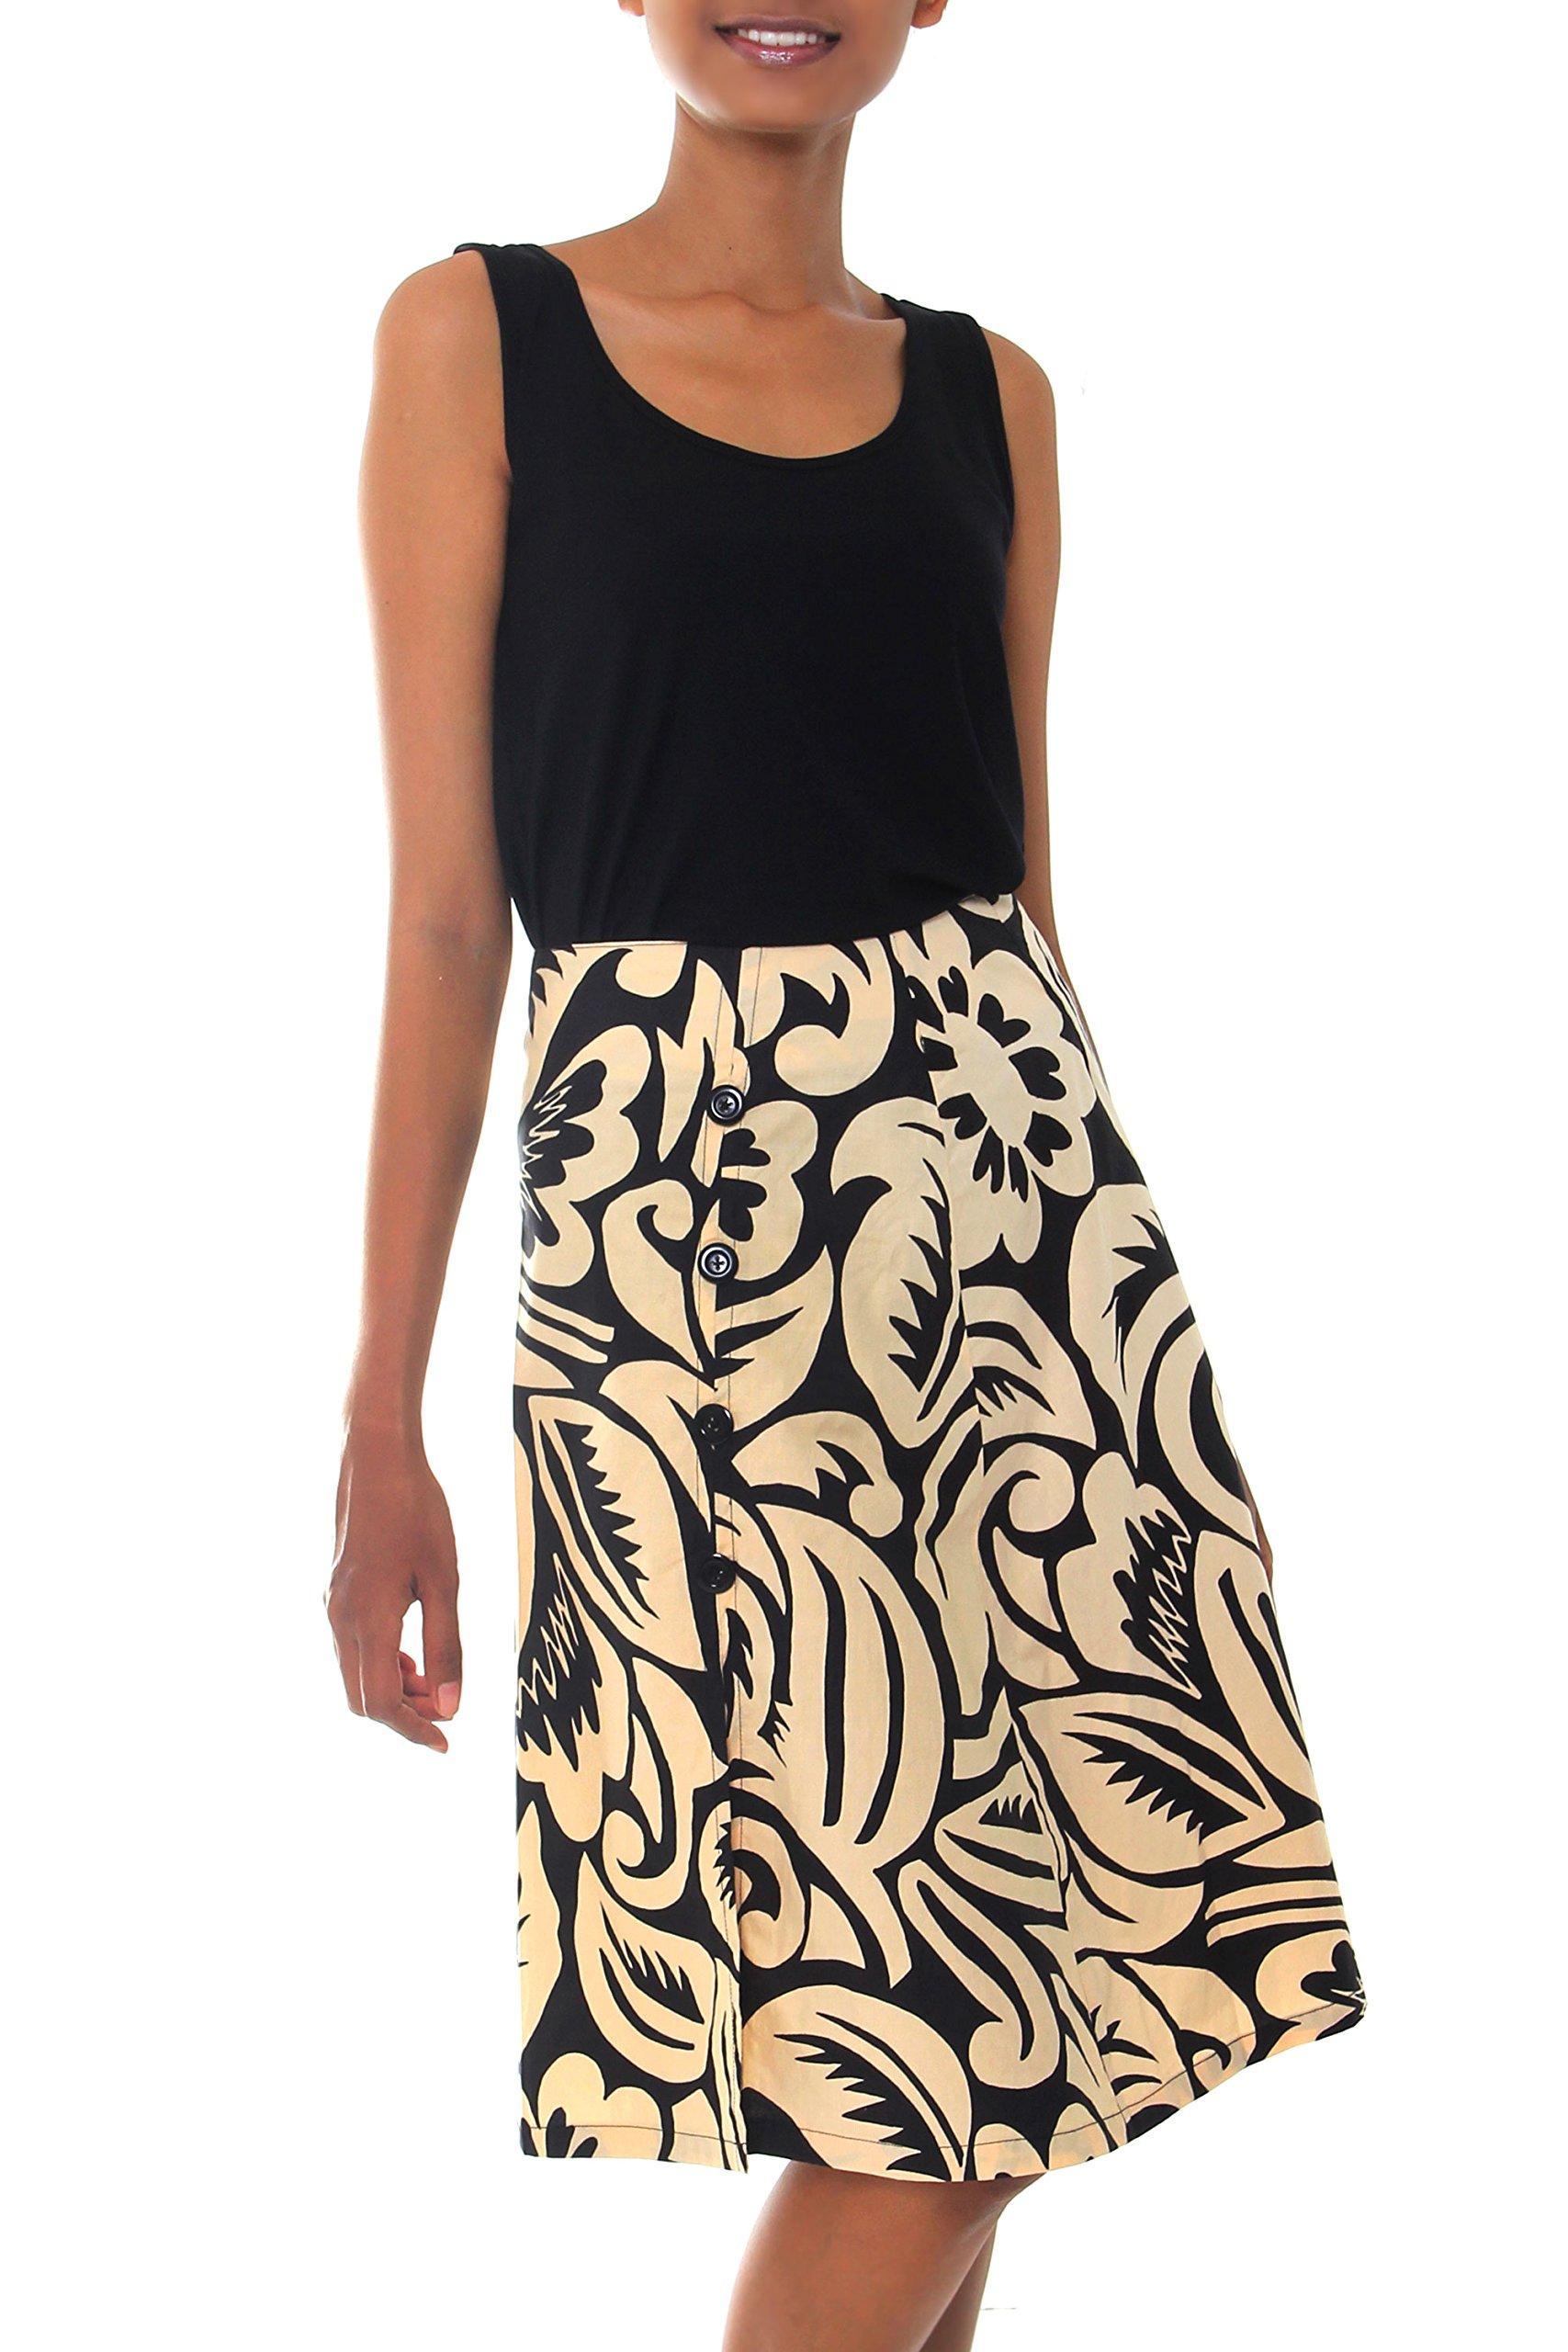 NOVICA Black 100% Cotton Batik Wrap Skirt, 'Balinese Shadow'